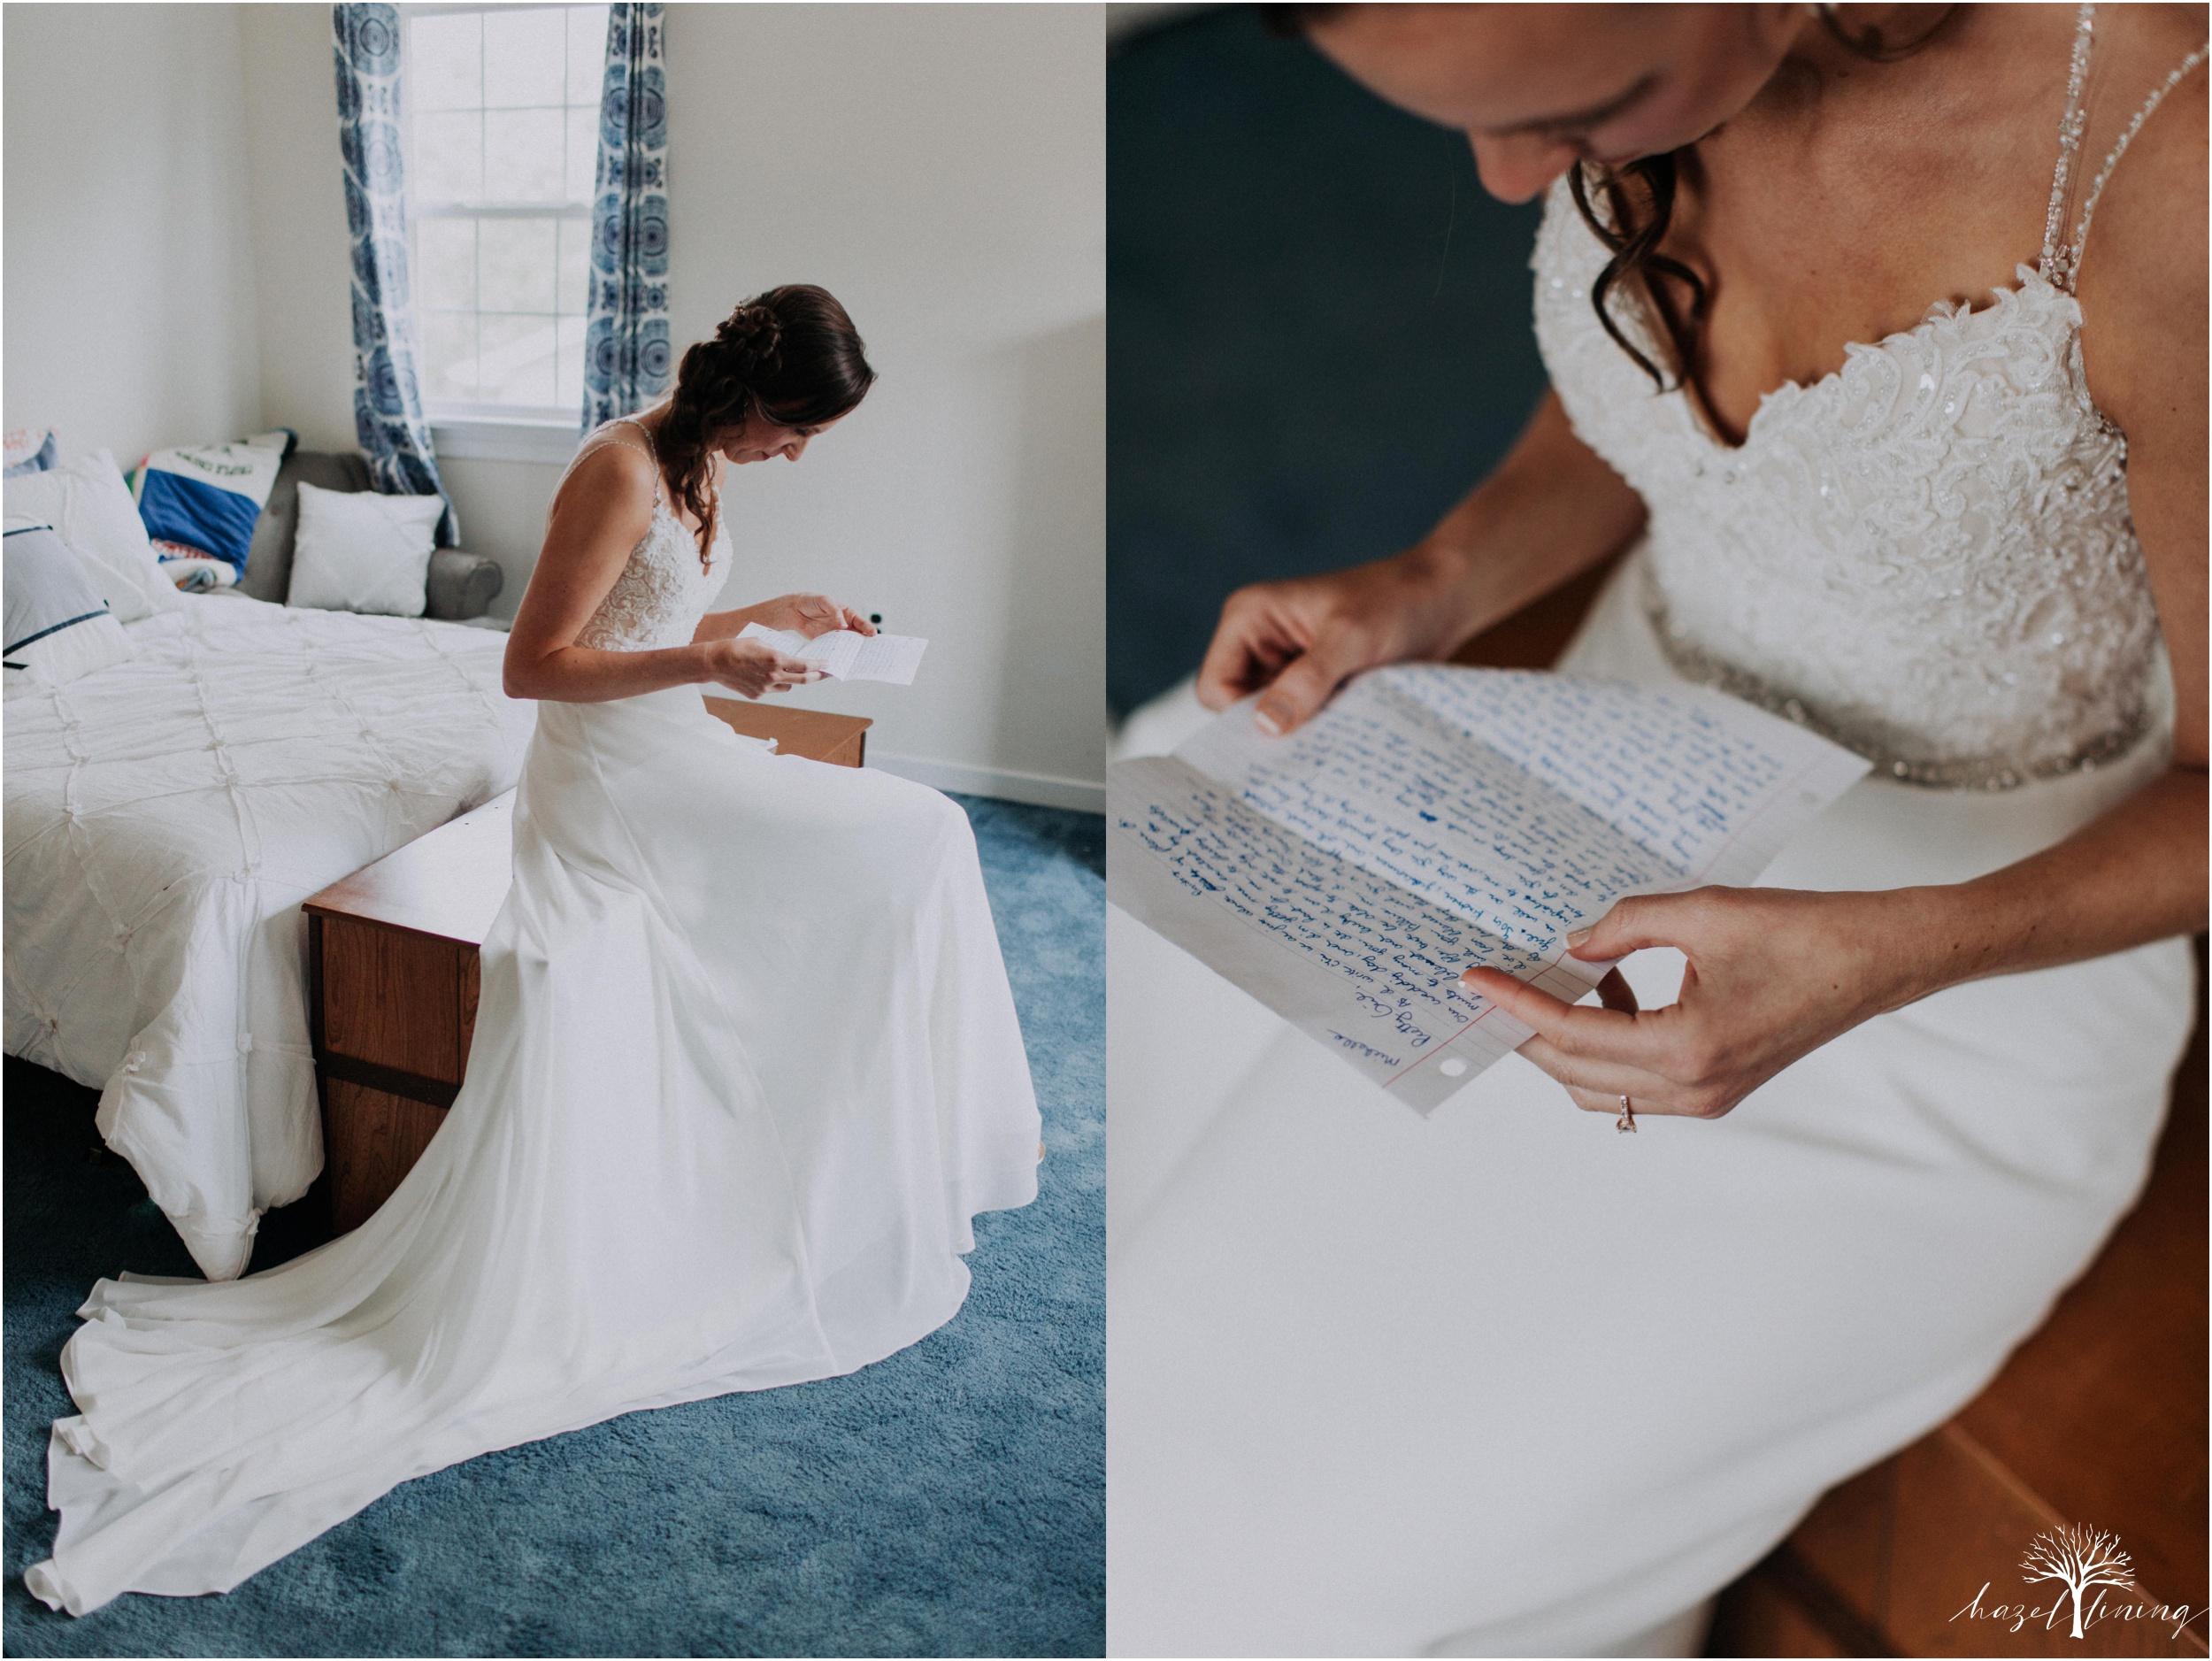 hazel-lining-travel-wedding-elopement-photography_0024.jpg